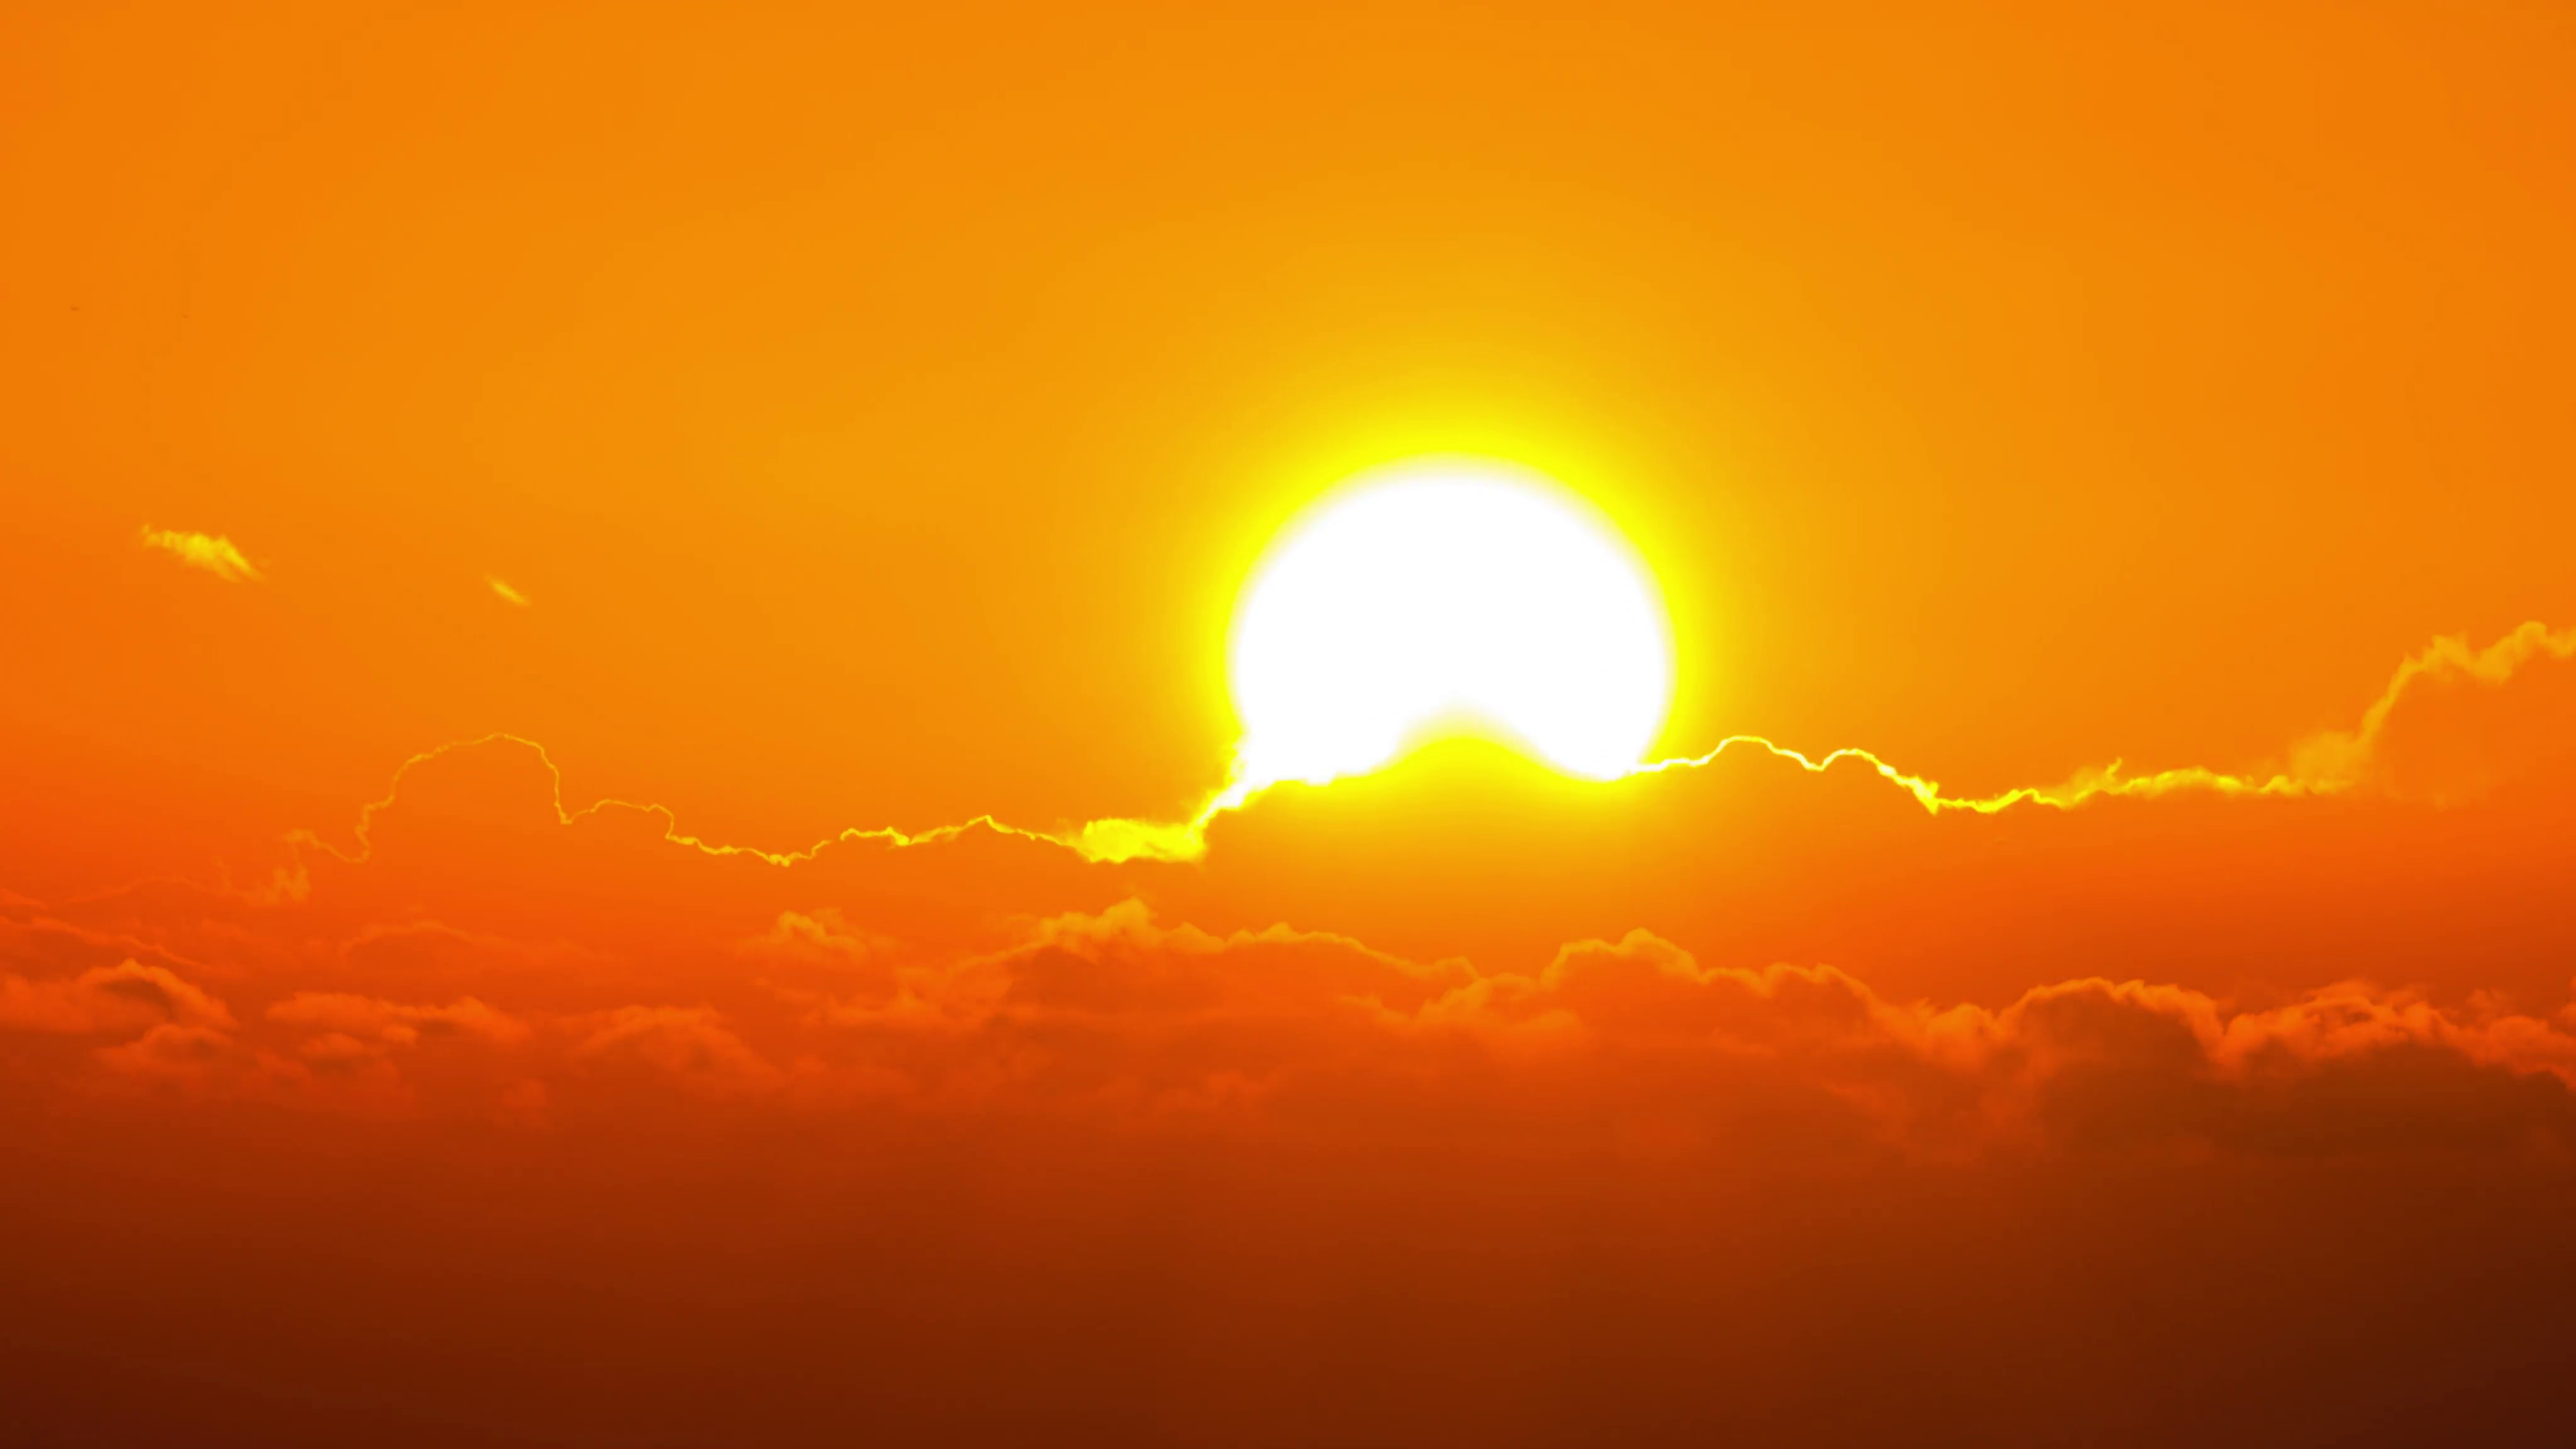 Sun HD PNG - 90316